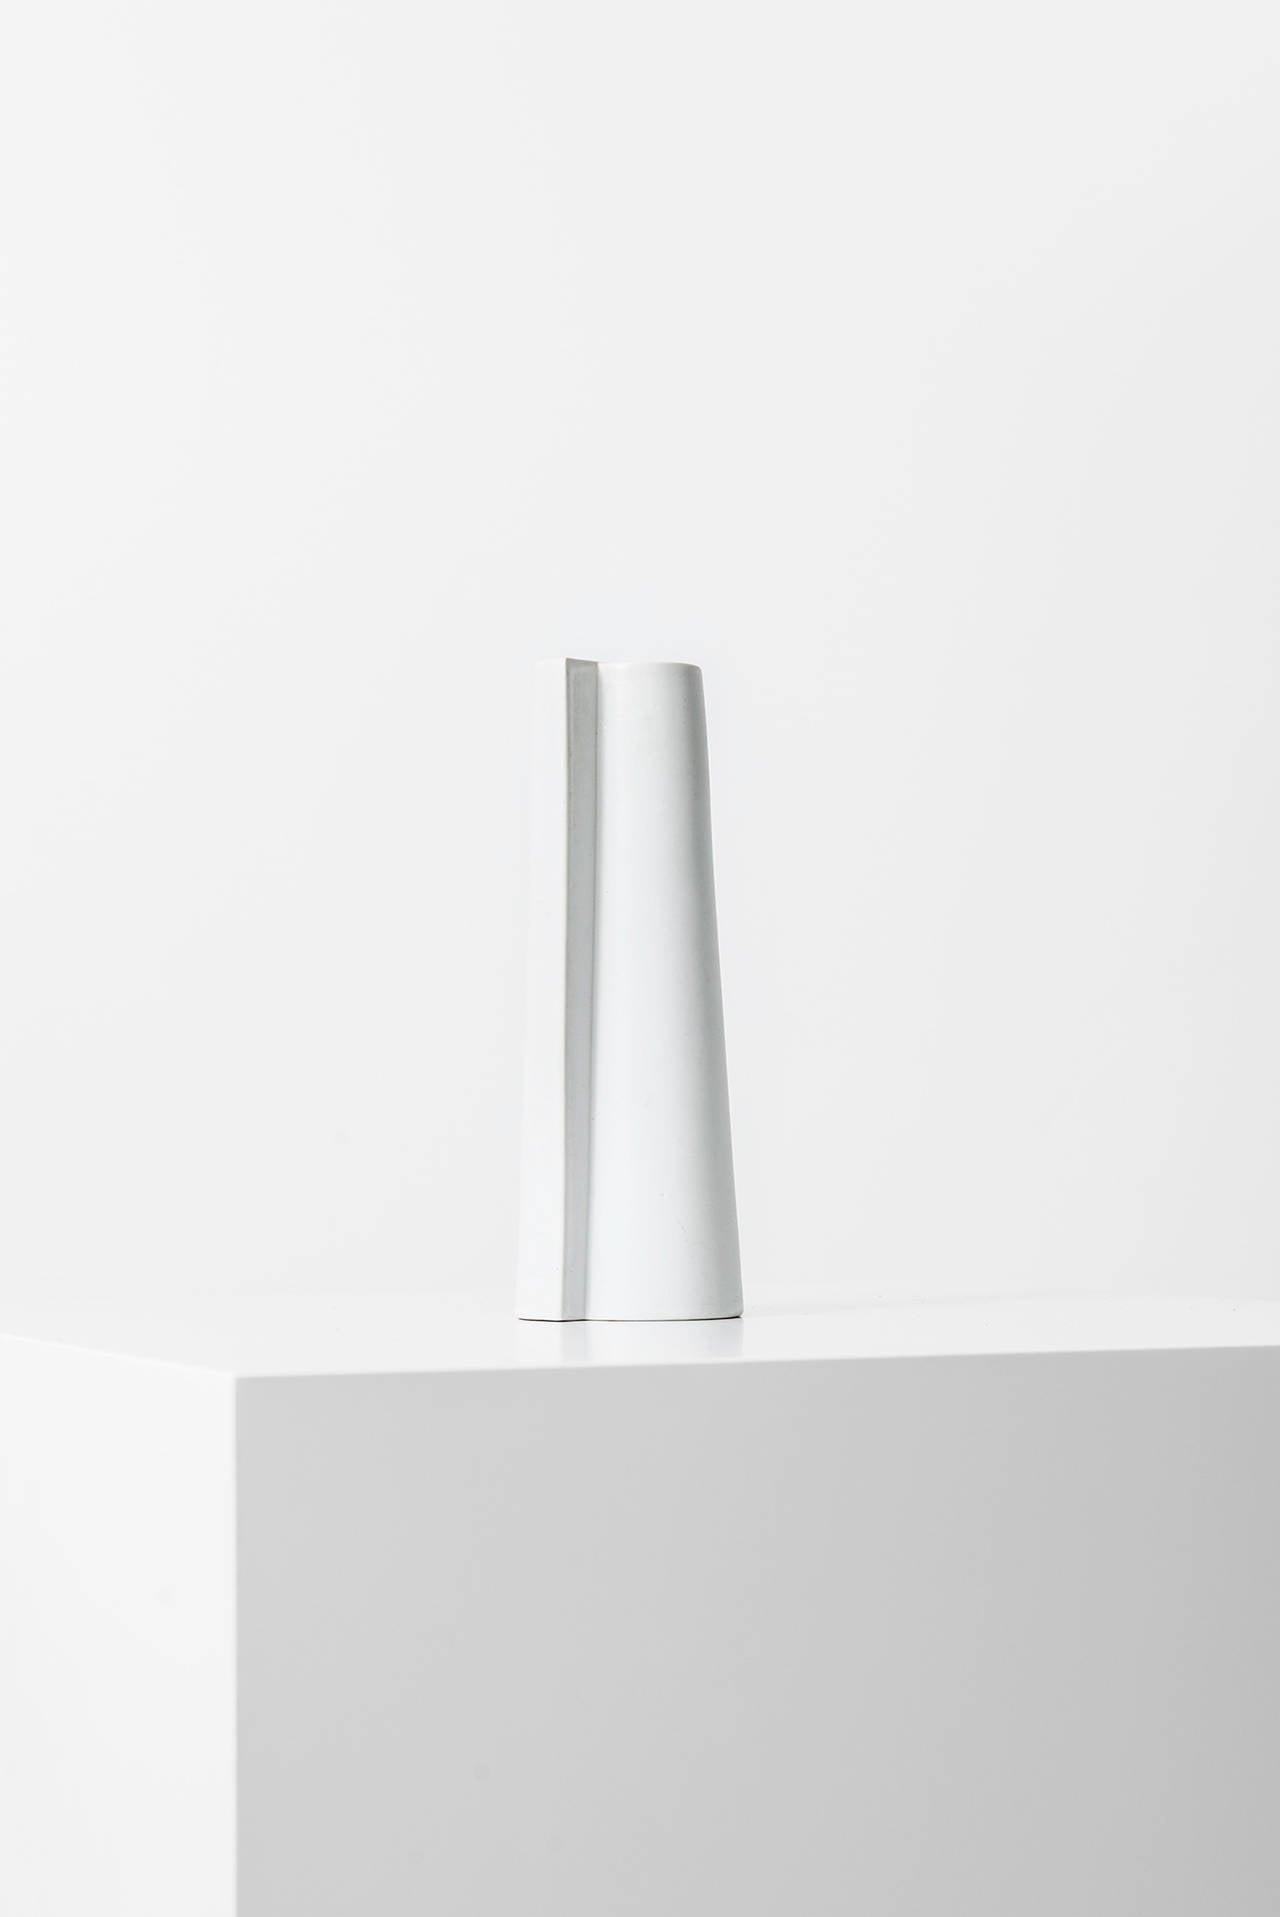 Wilhelm Kåge Ceramic Vase Model Surrea by Gustavsberg in Sweden 4